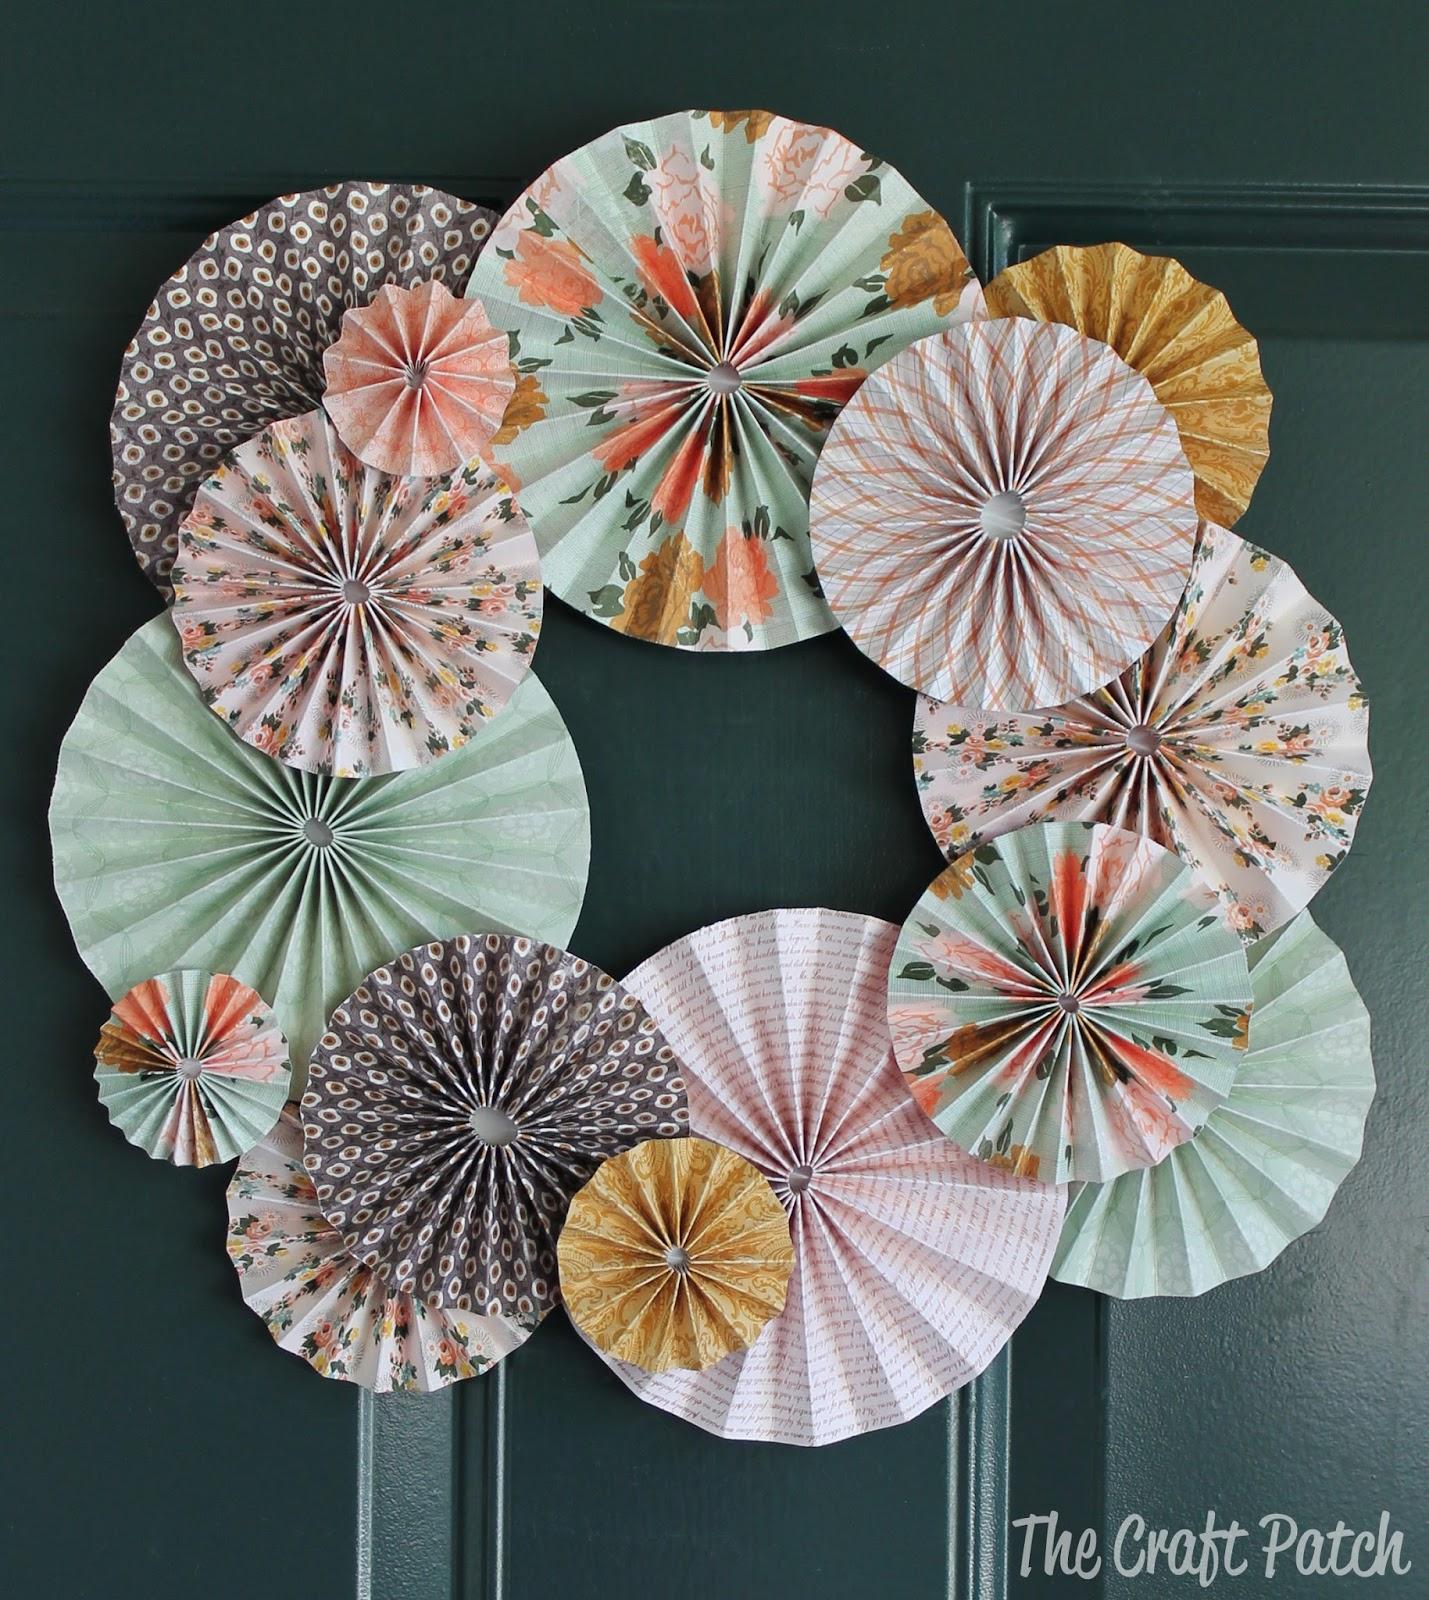 Accordion Fold Paper Flowers Thecraftpatchblog Com